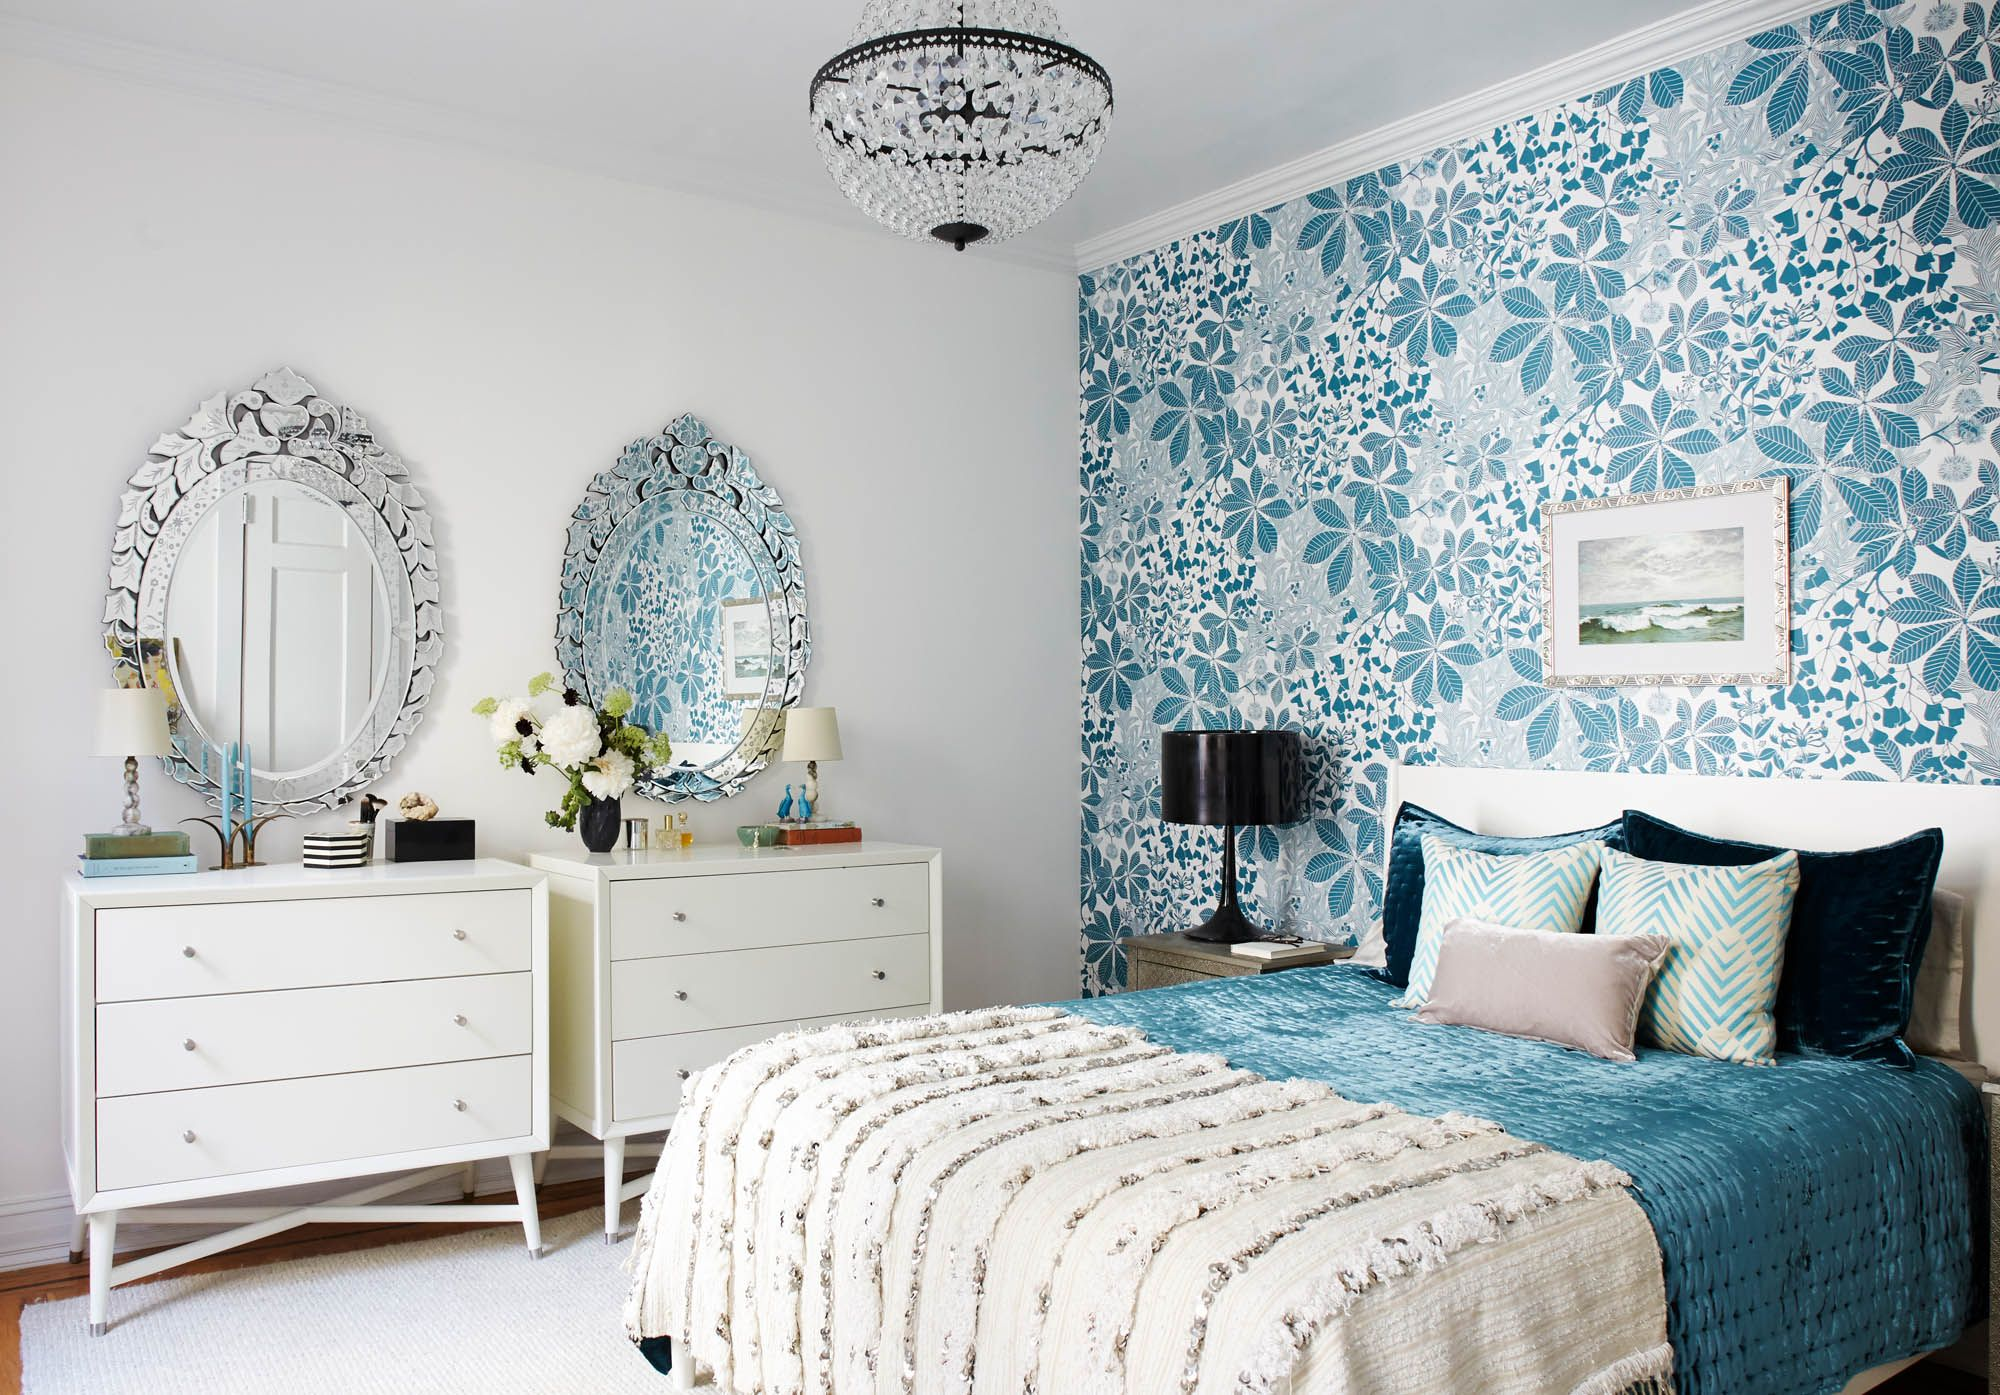 Vintage master bedroom decor  Pin by Krasimira Manolova on Home Decoration  Pinterest  Blue